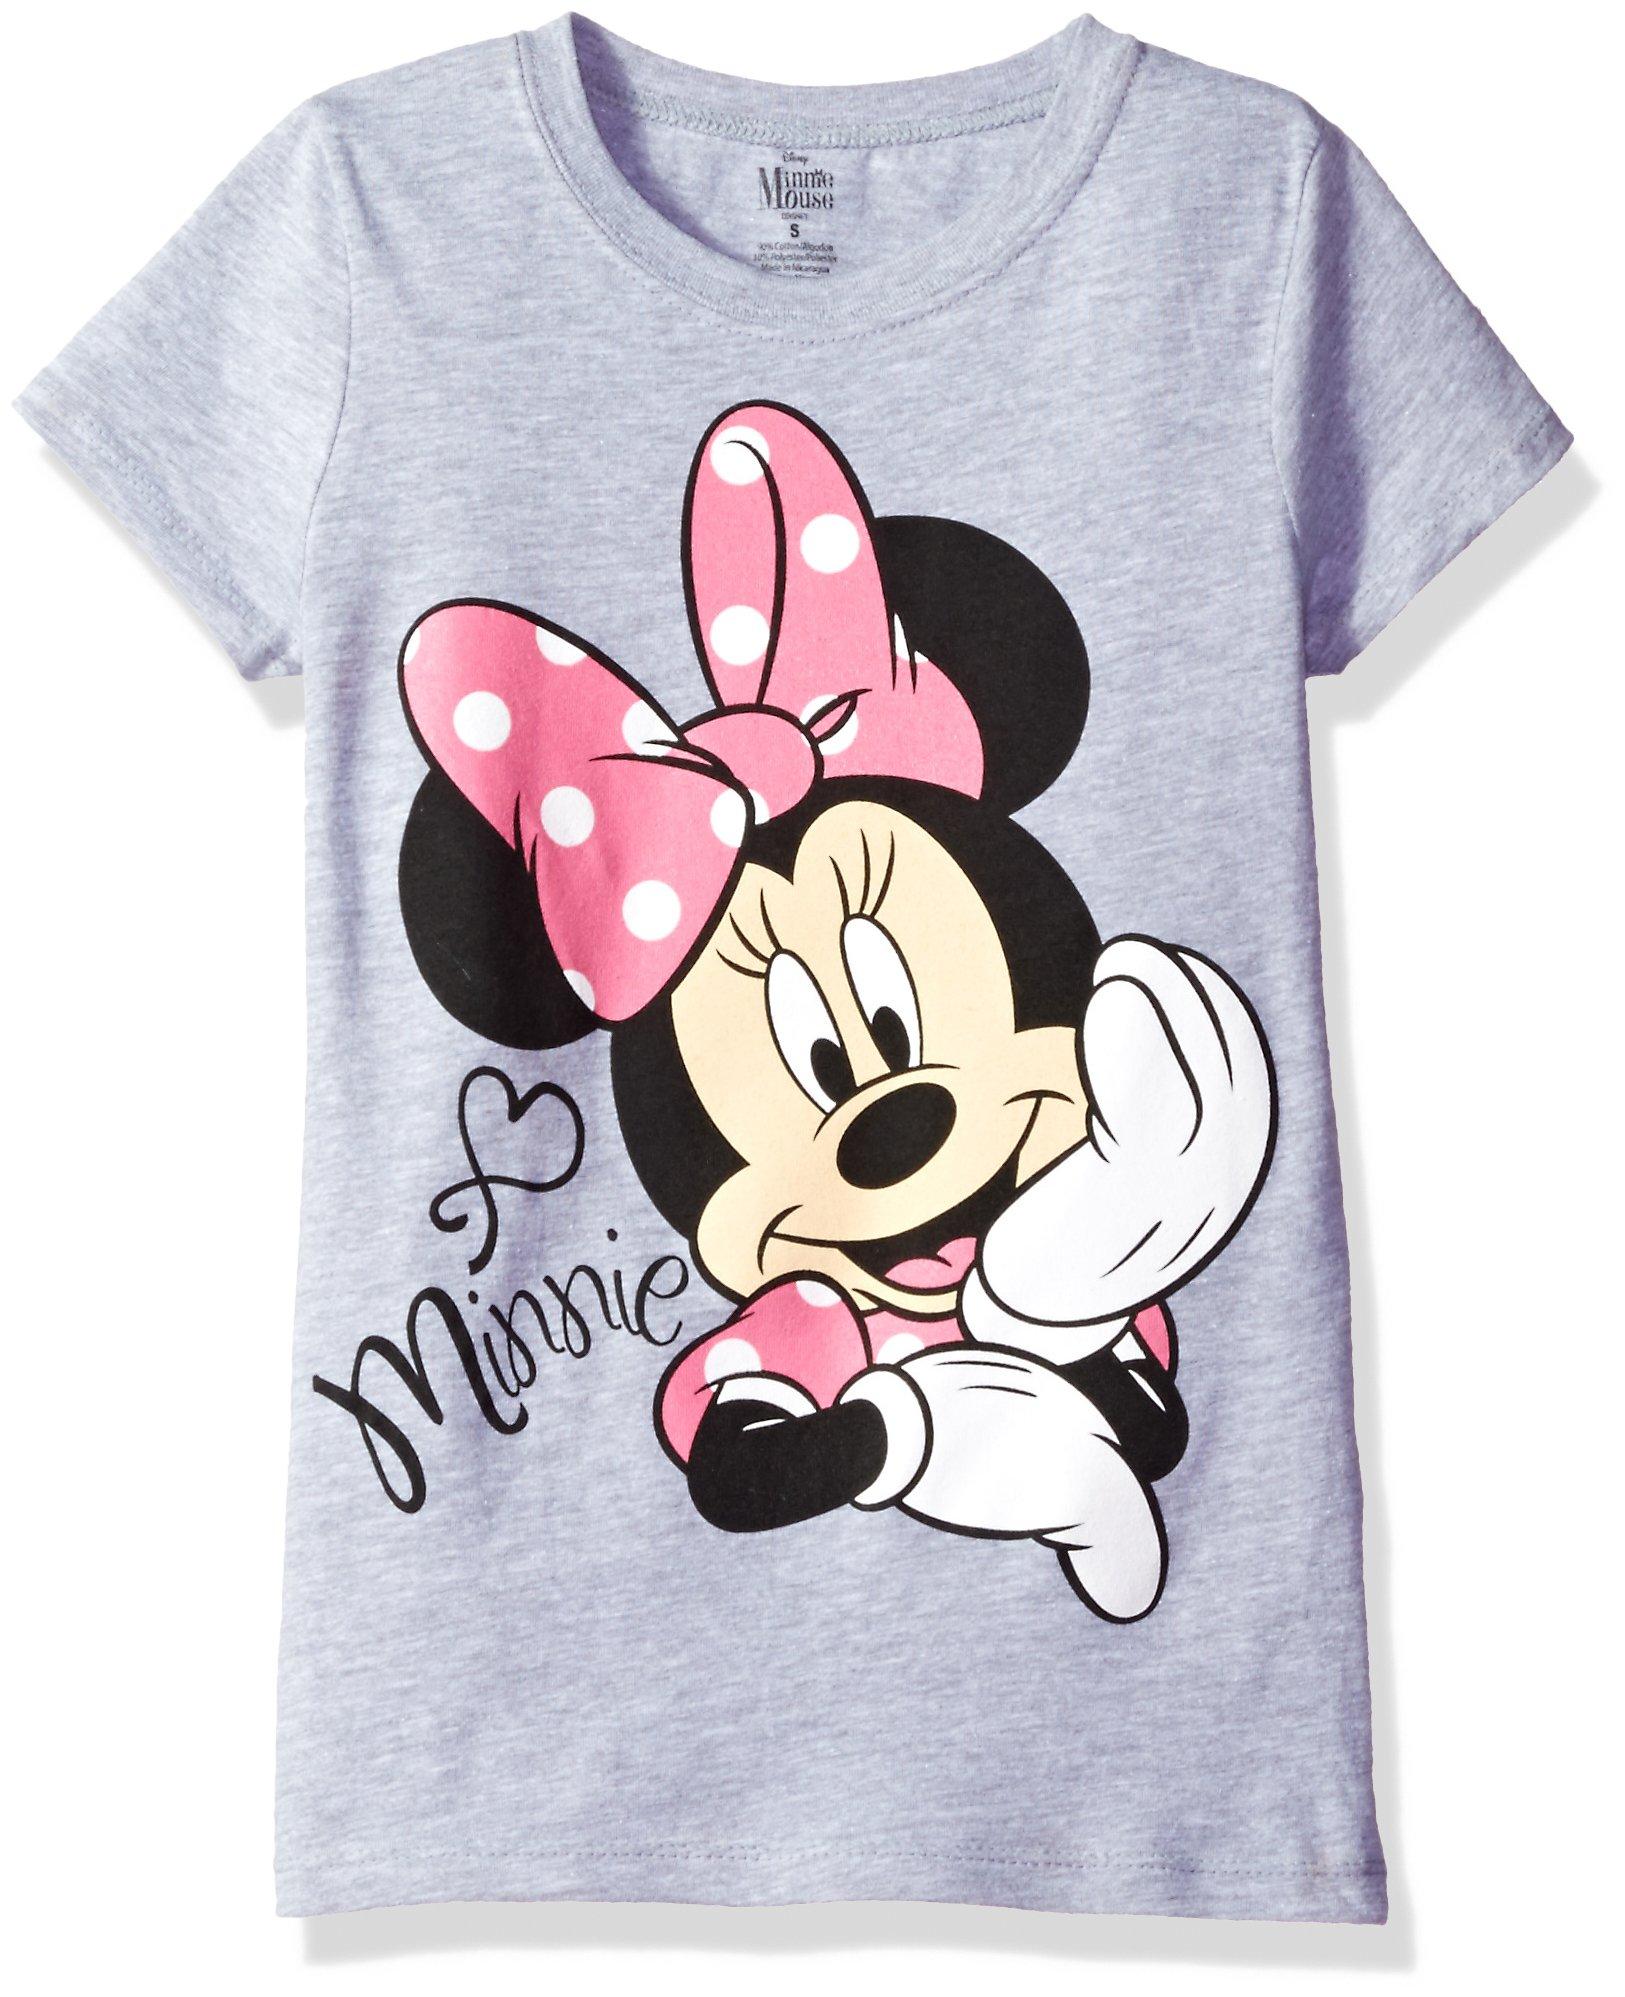 Disney Girls' Toddler Girls' Minnie Mouse Short Sleeve T-Shirt, Heather Grey, 5T